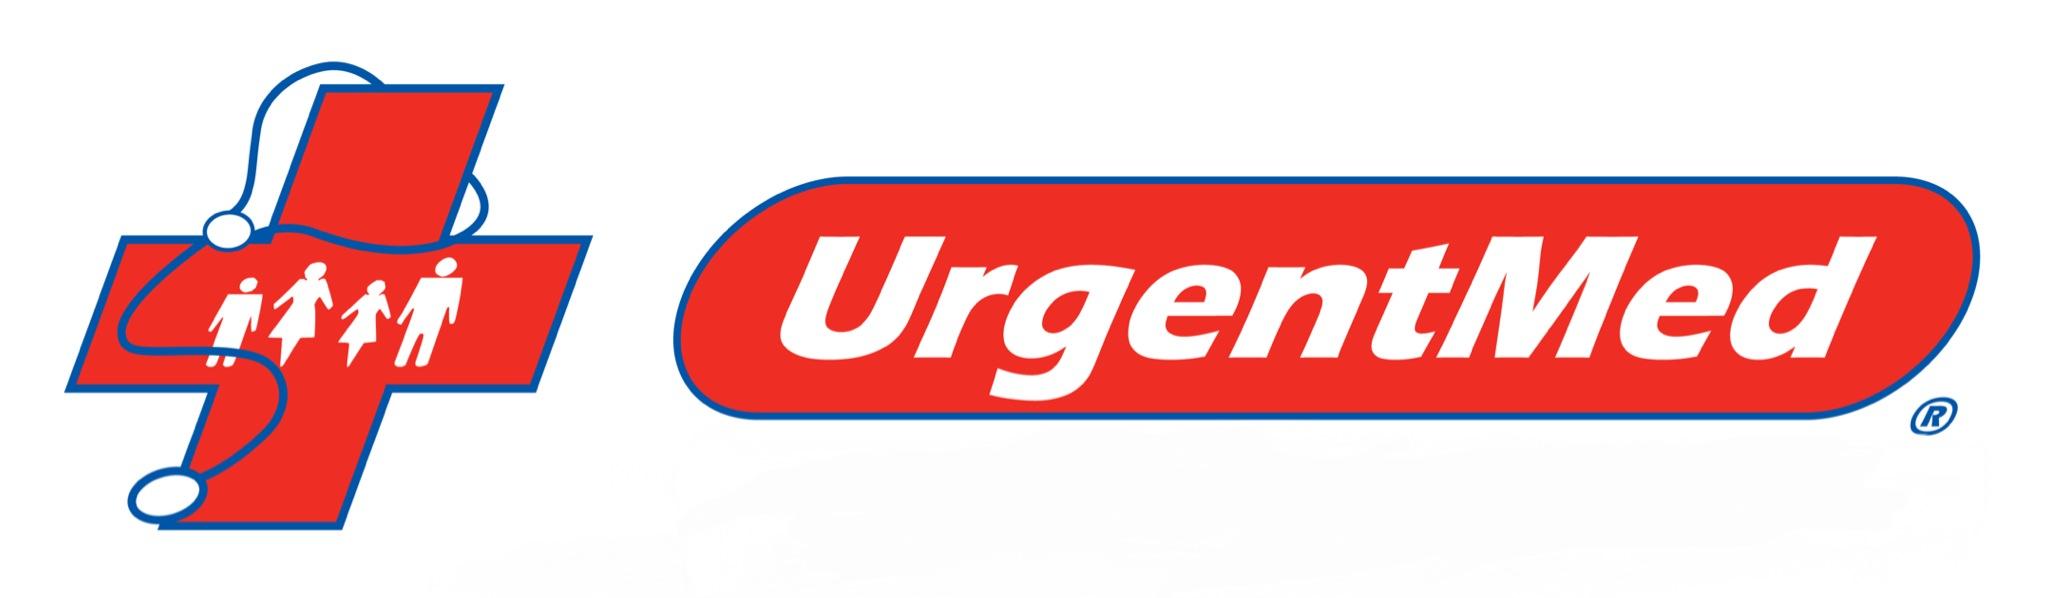 UrgentMed - Telemed Logo